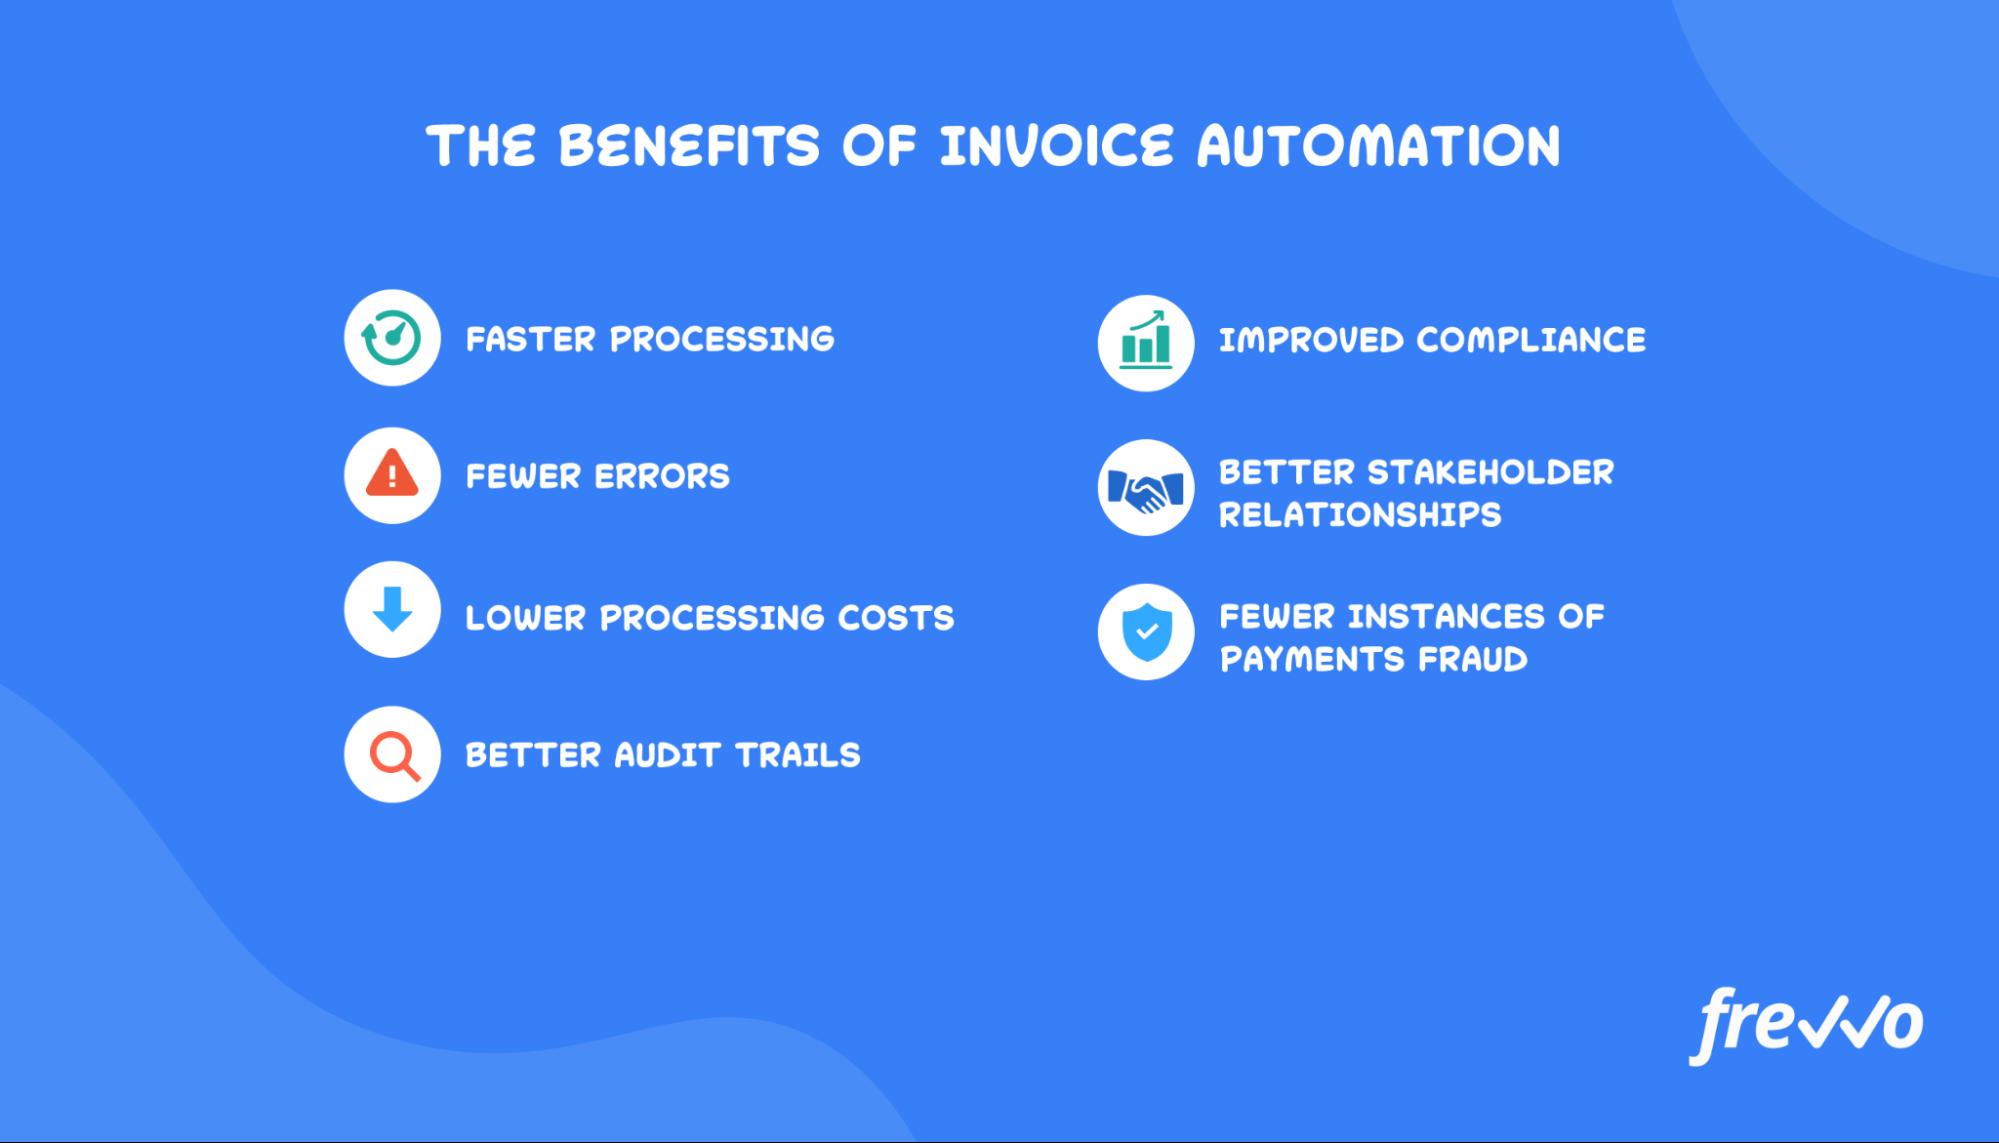 invoice automation benefits